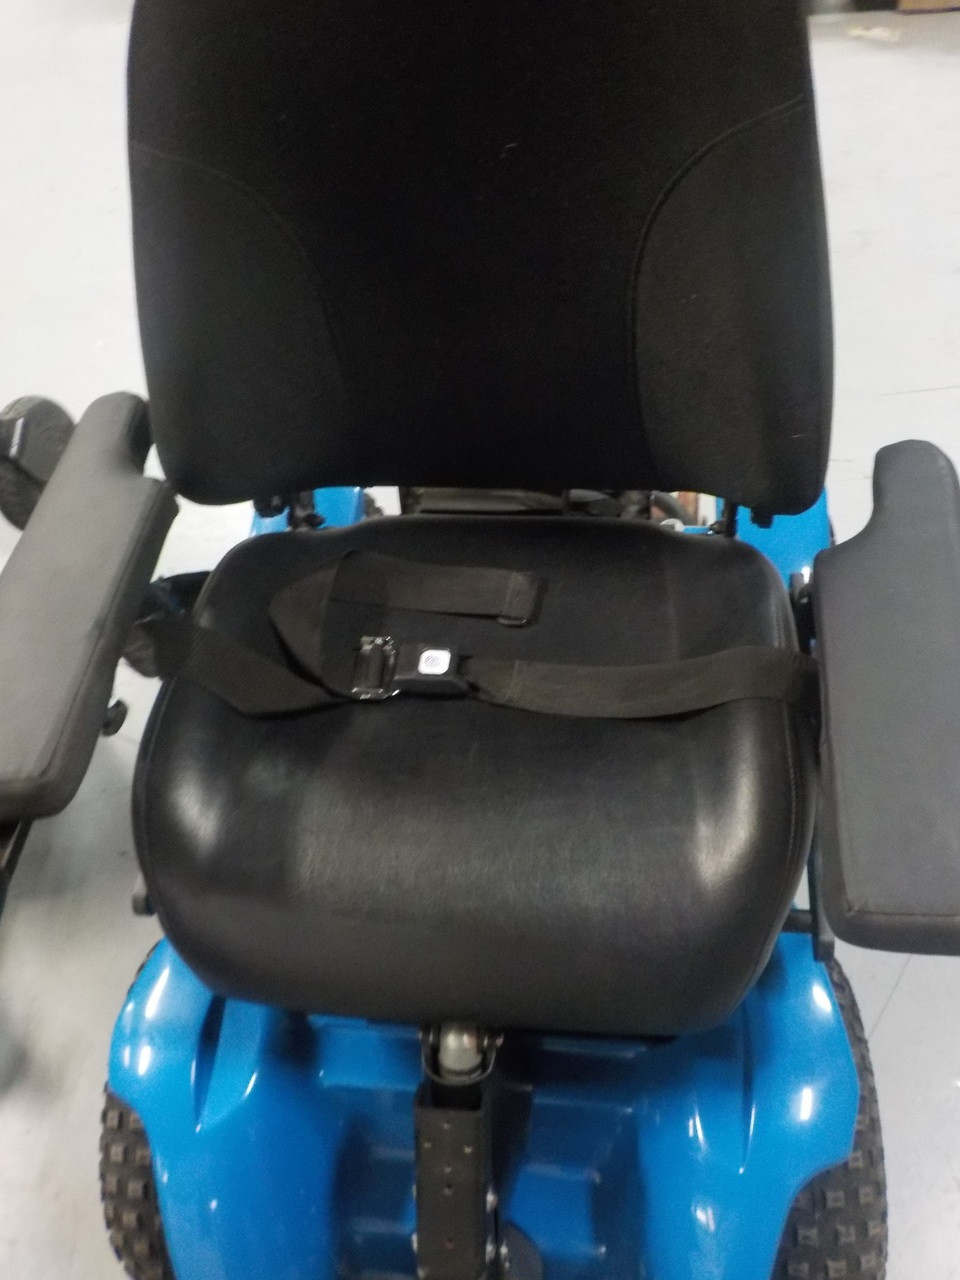 X8 4X4 Extreme All-Terrain Electric Power Wheelchair Blue Demo Model